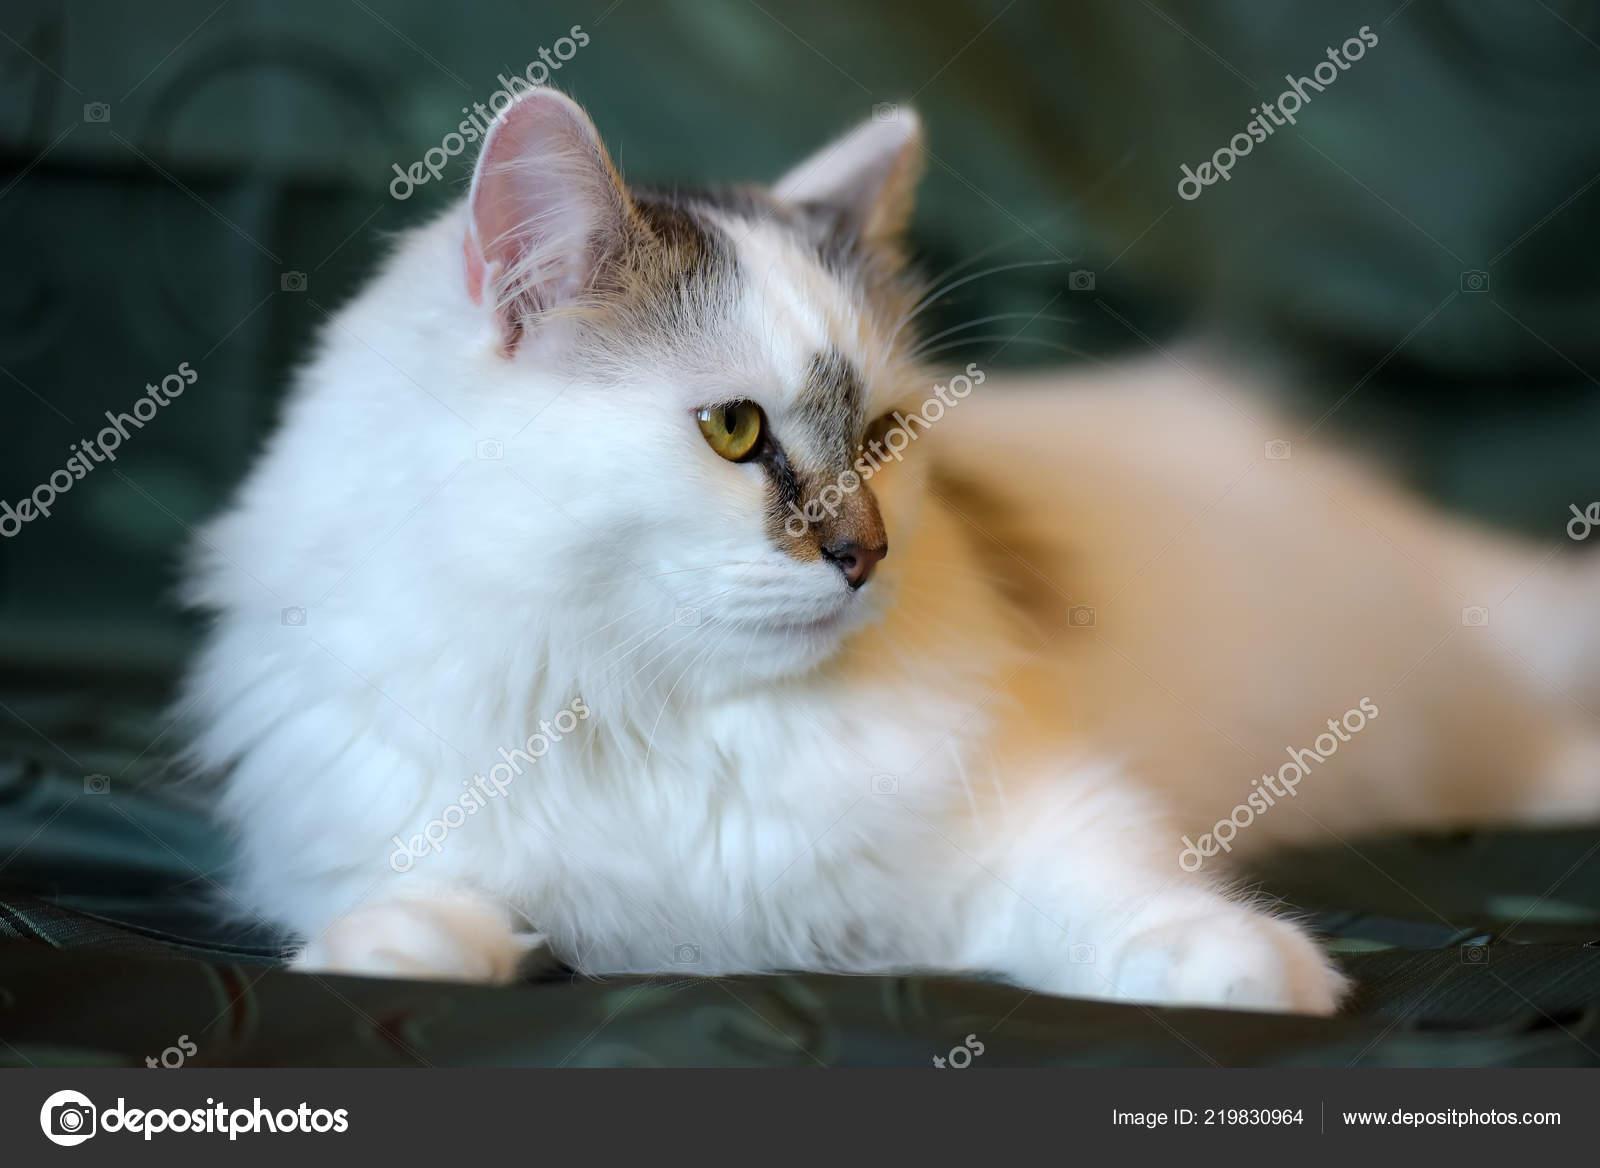 Beautiful White Fluffy Cat Brown Markings Stock Photo C Evdoha 219830964